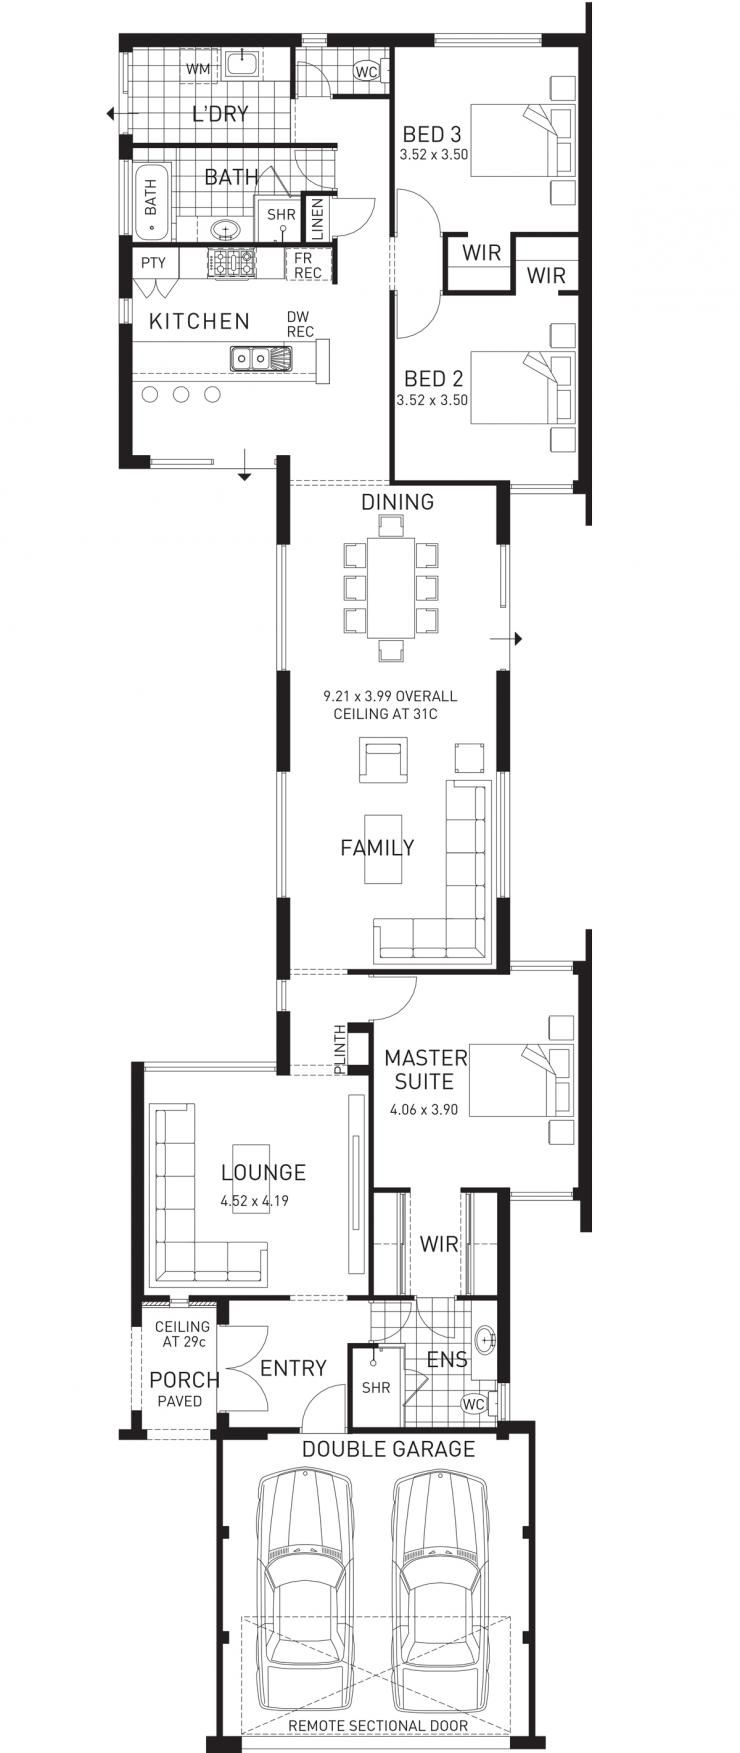 Colonnade Single Storey Narrow Home Floor Plan Wa Narrow House Plans Narrow Lot House Plans Narrow House Designs